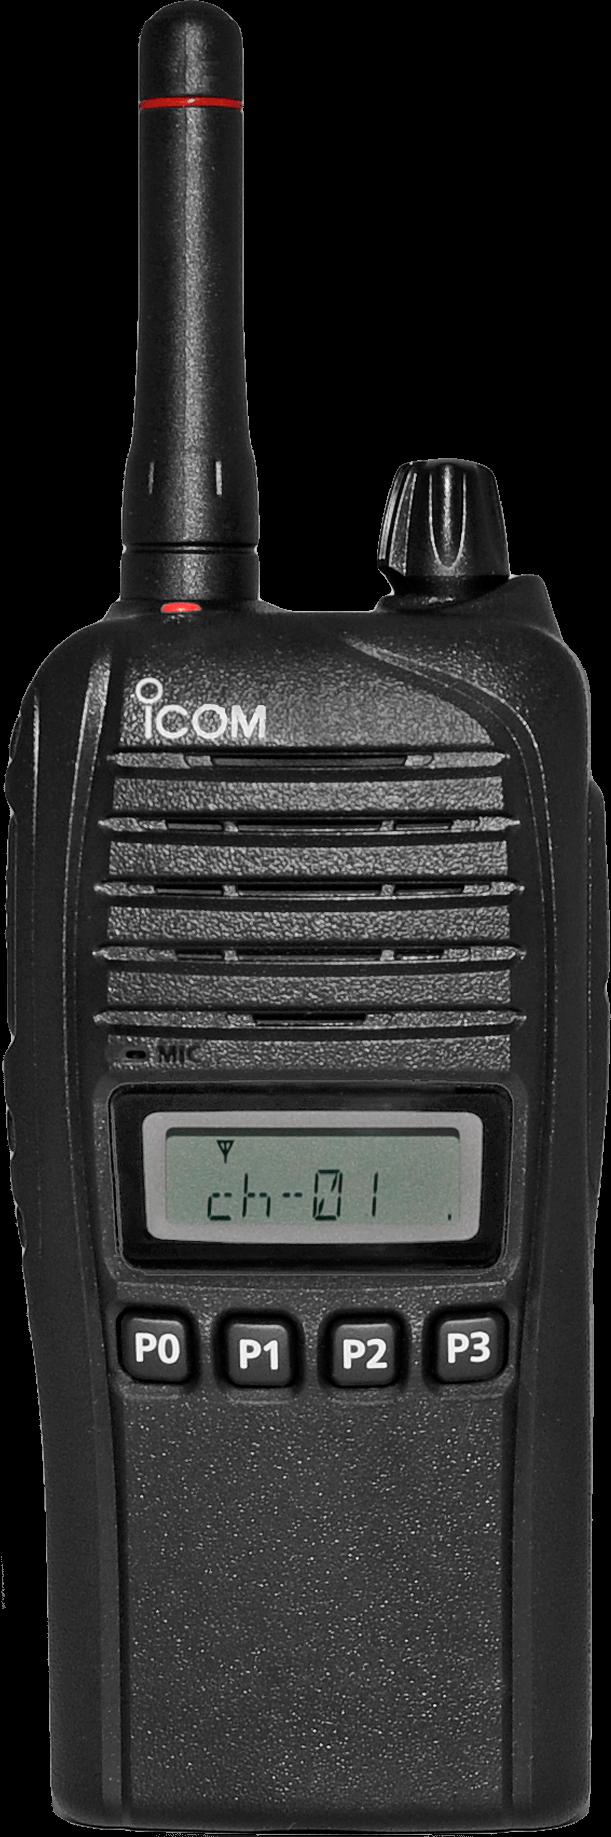 Icom IC-F3032S featured image